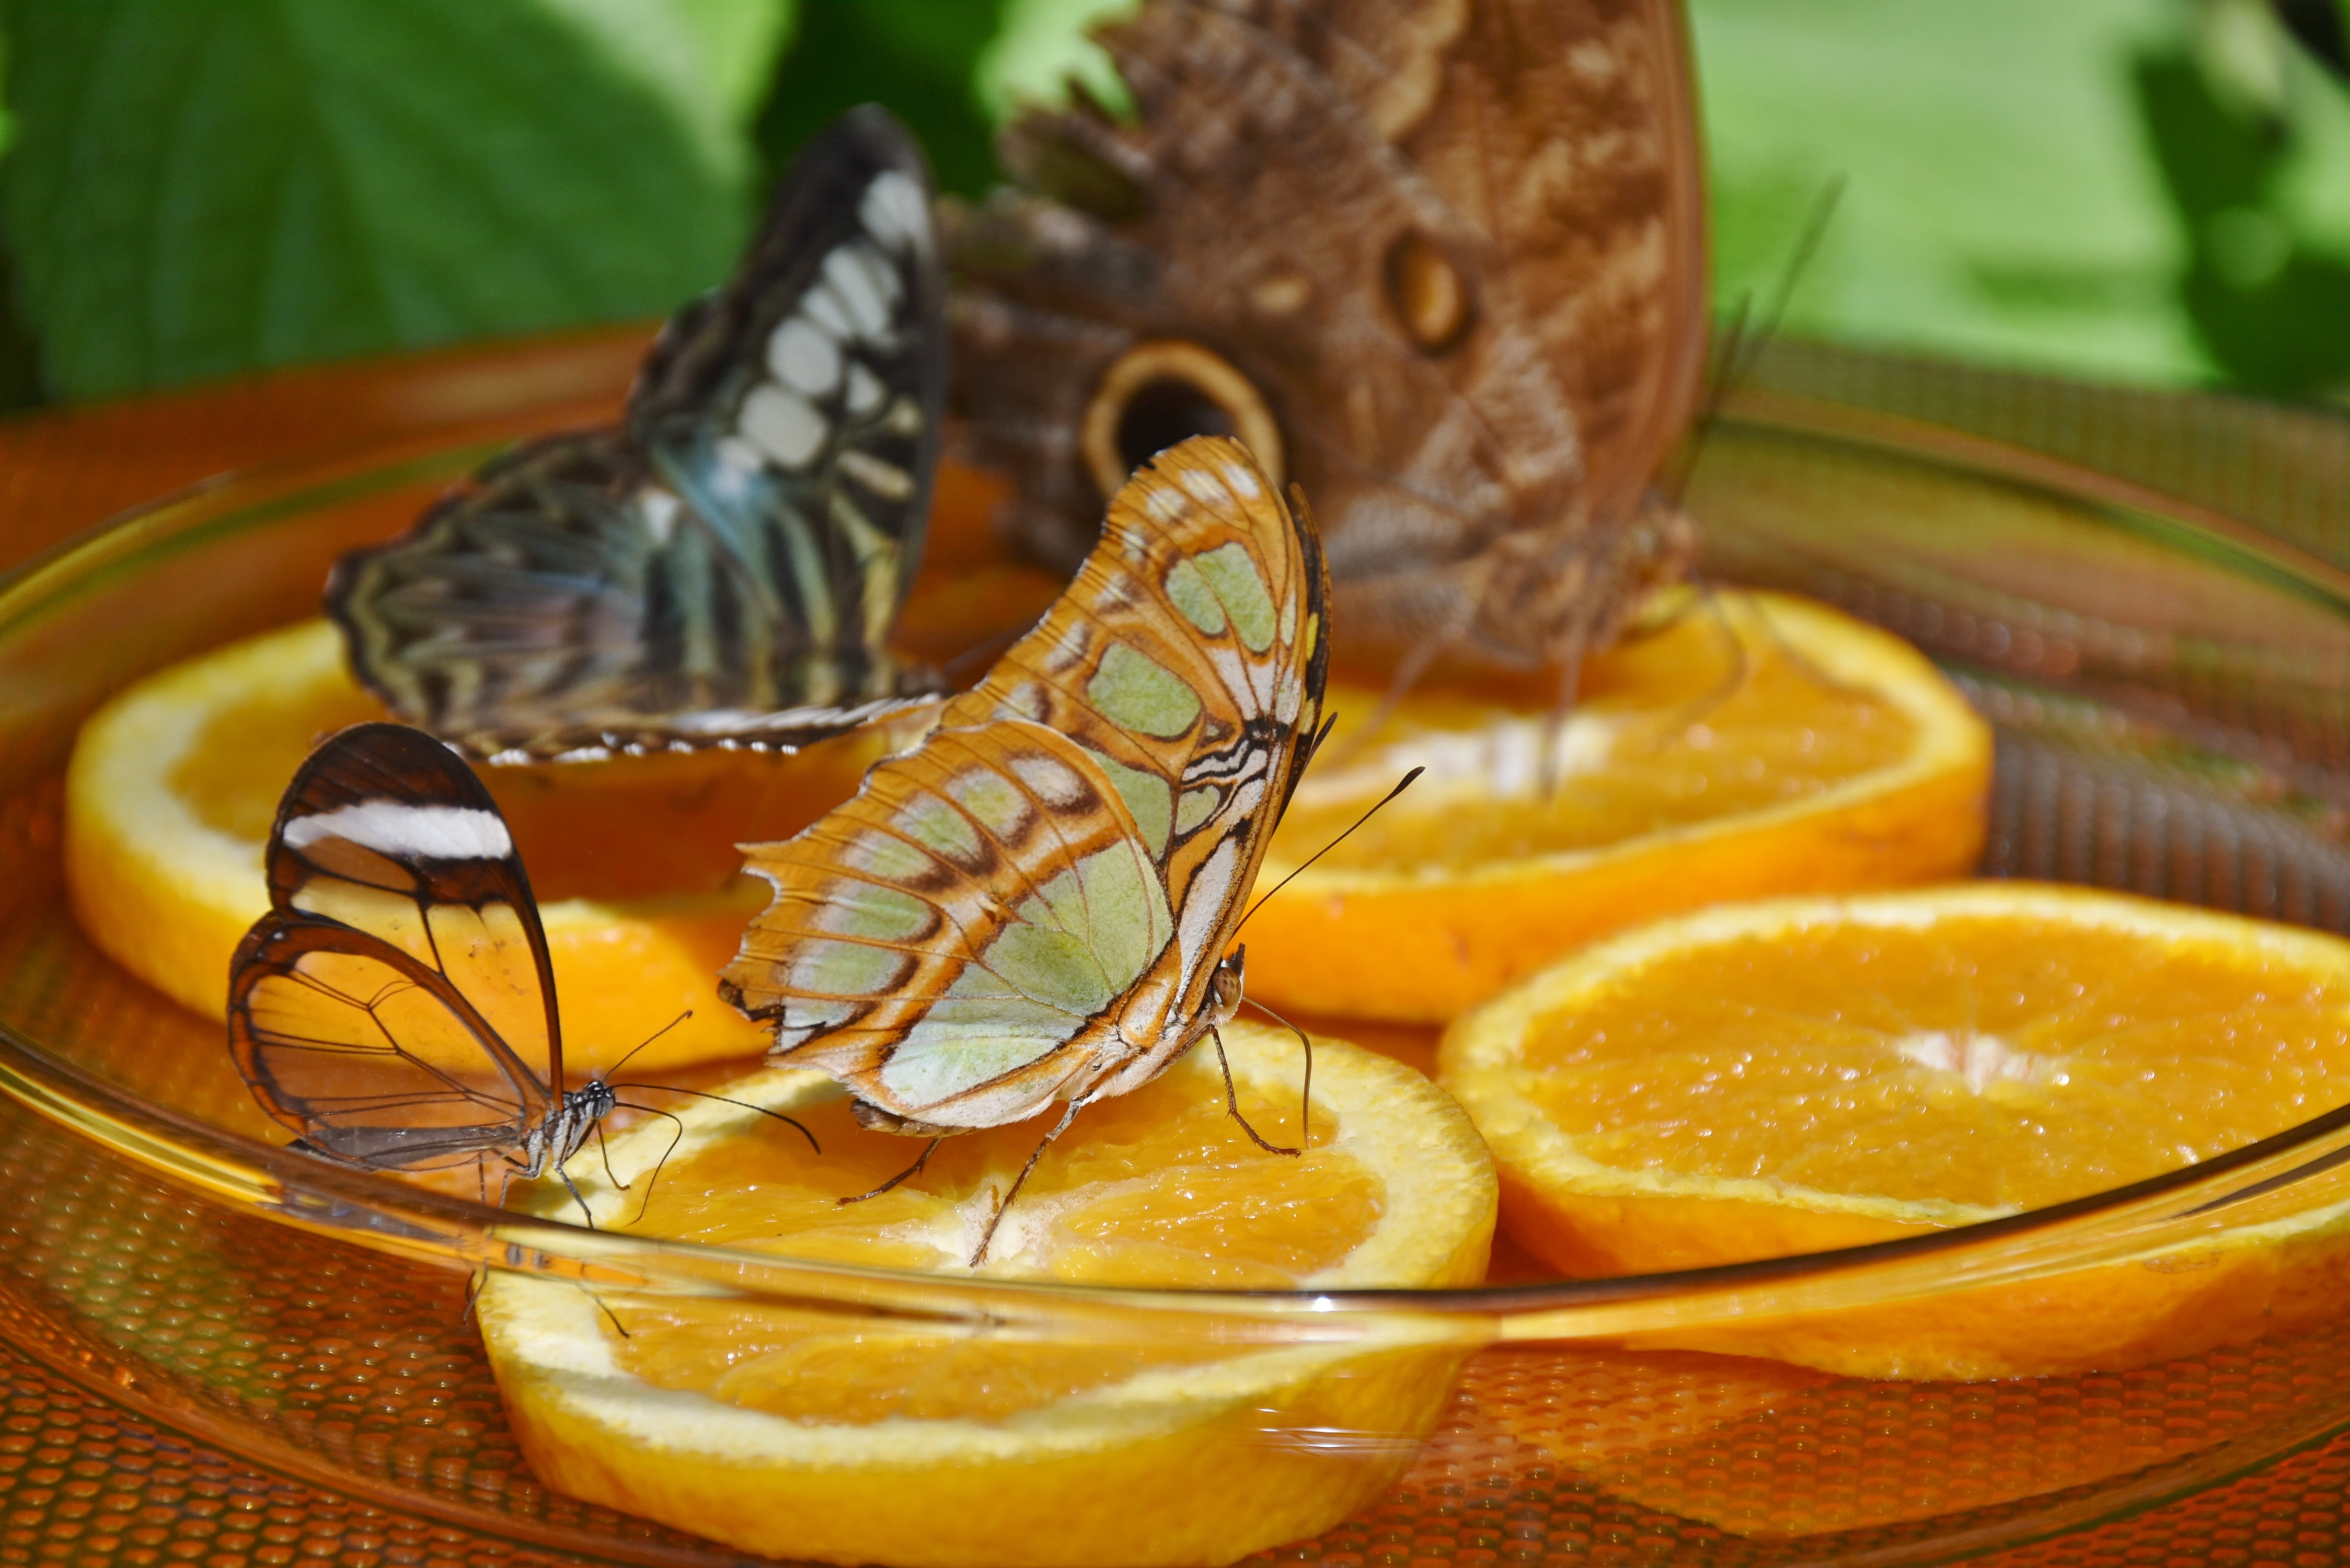 Butterflies on oranges